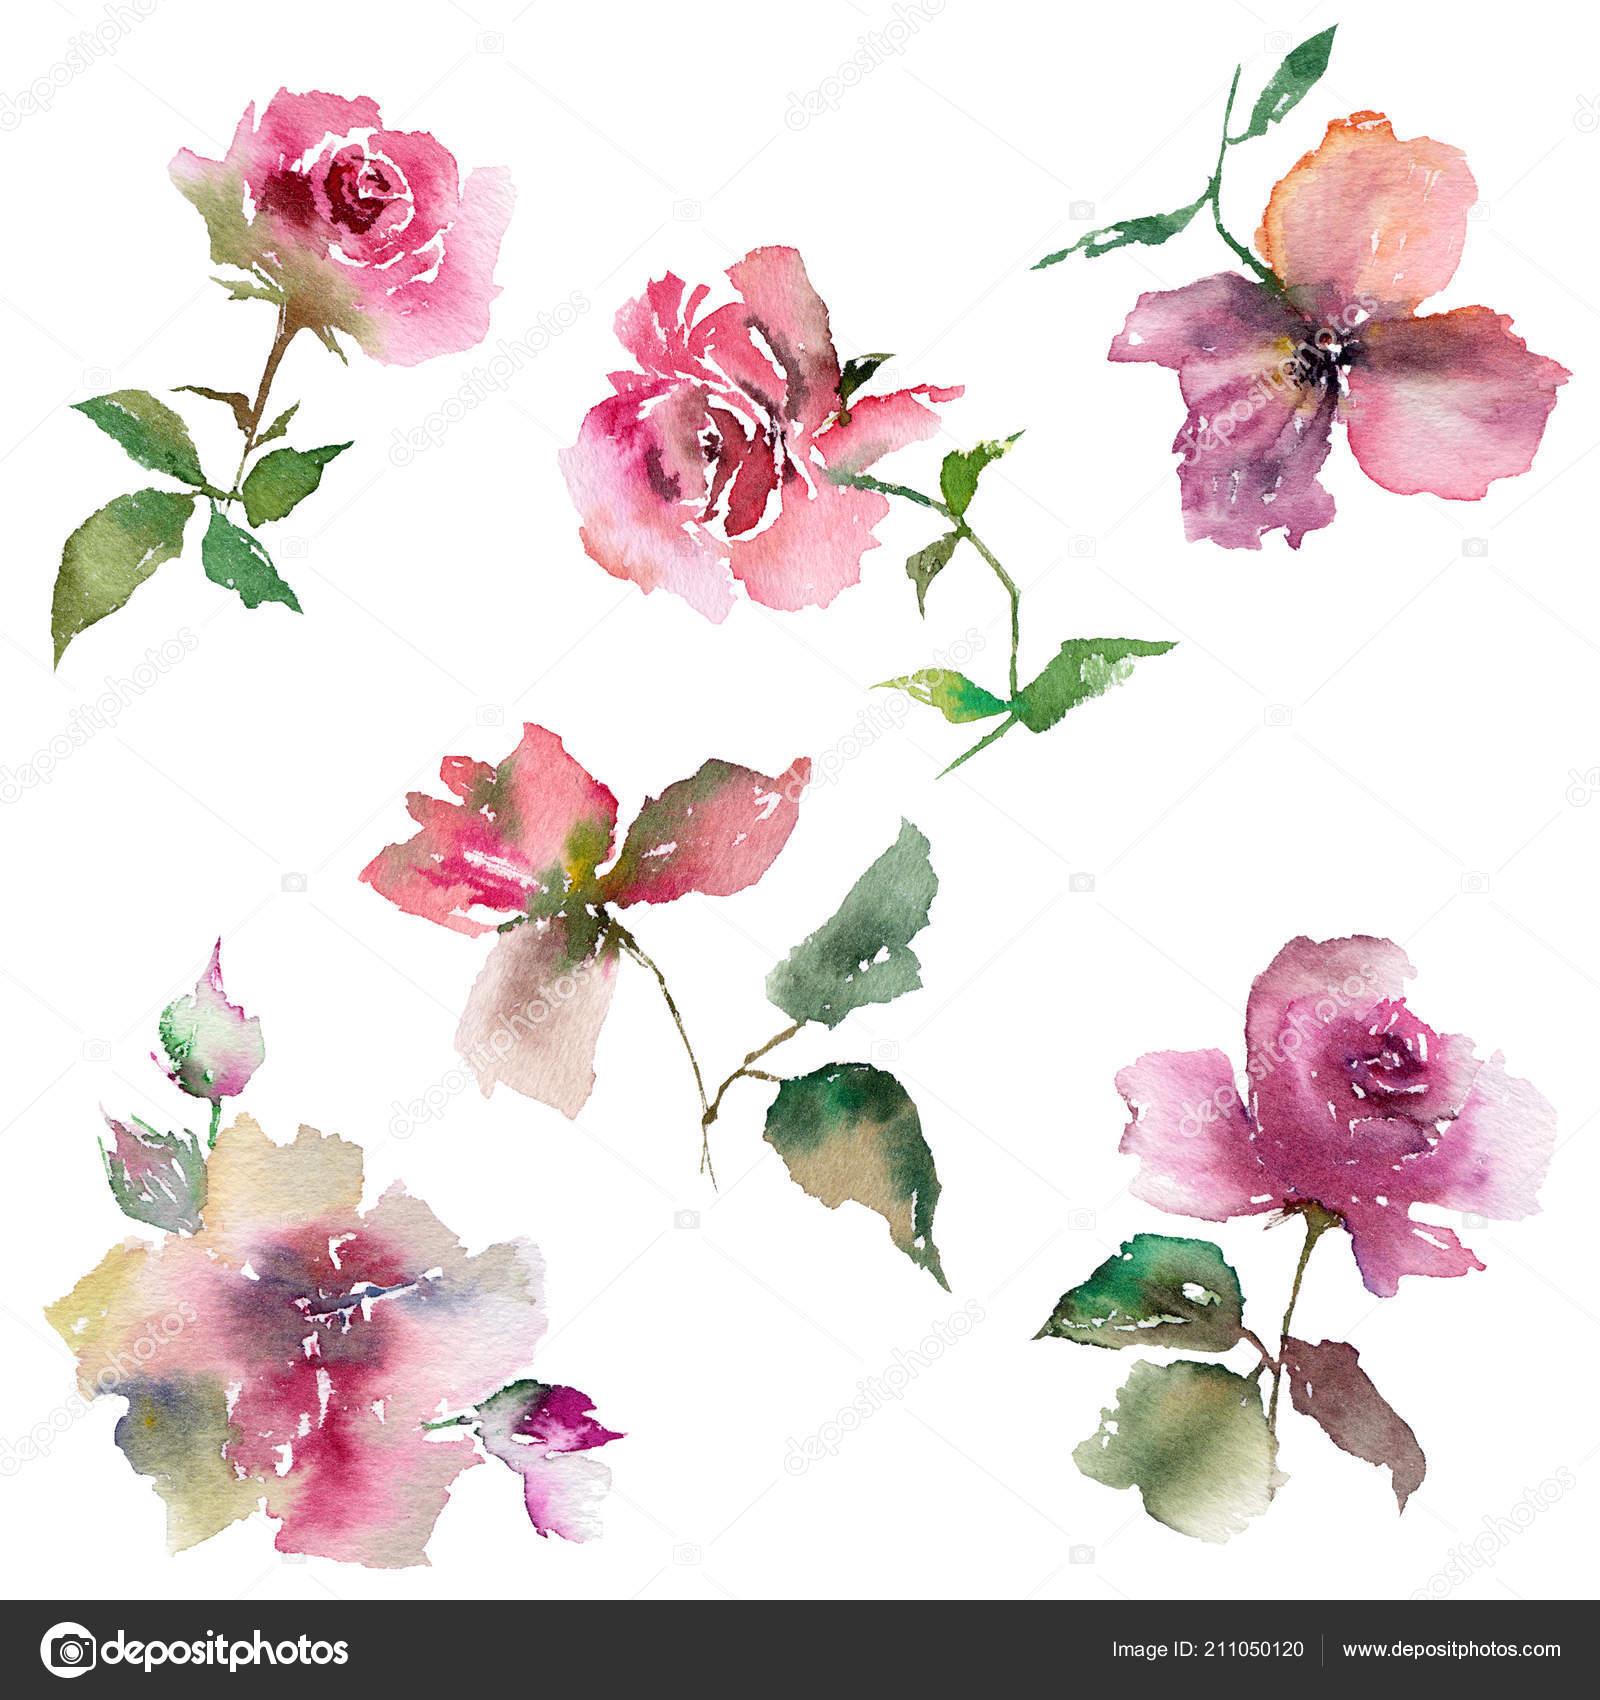 Watercolor Flowers Set Floral Decorative Elements Delicate Drawing